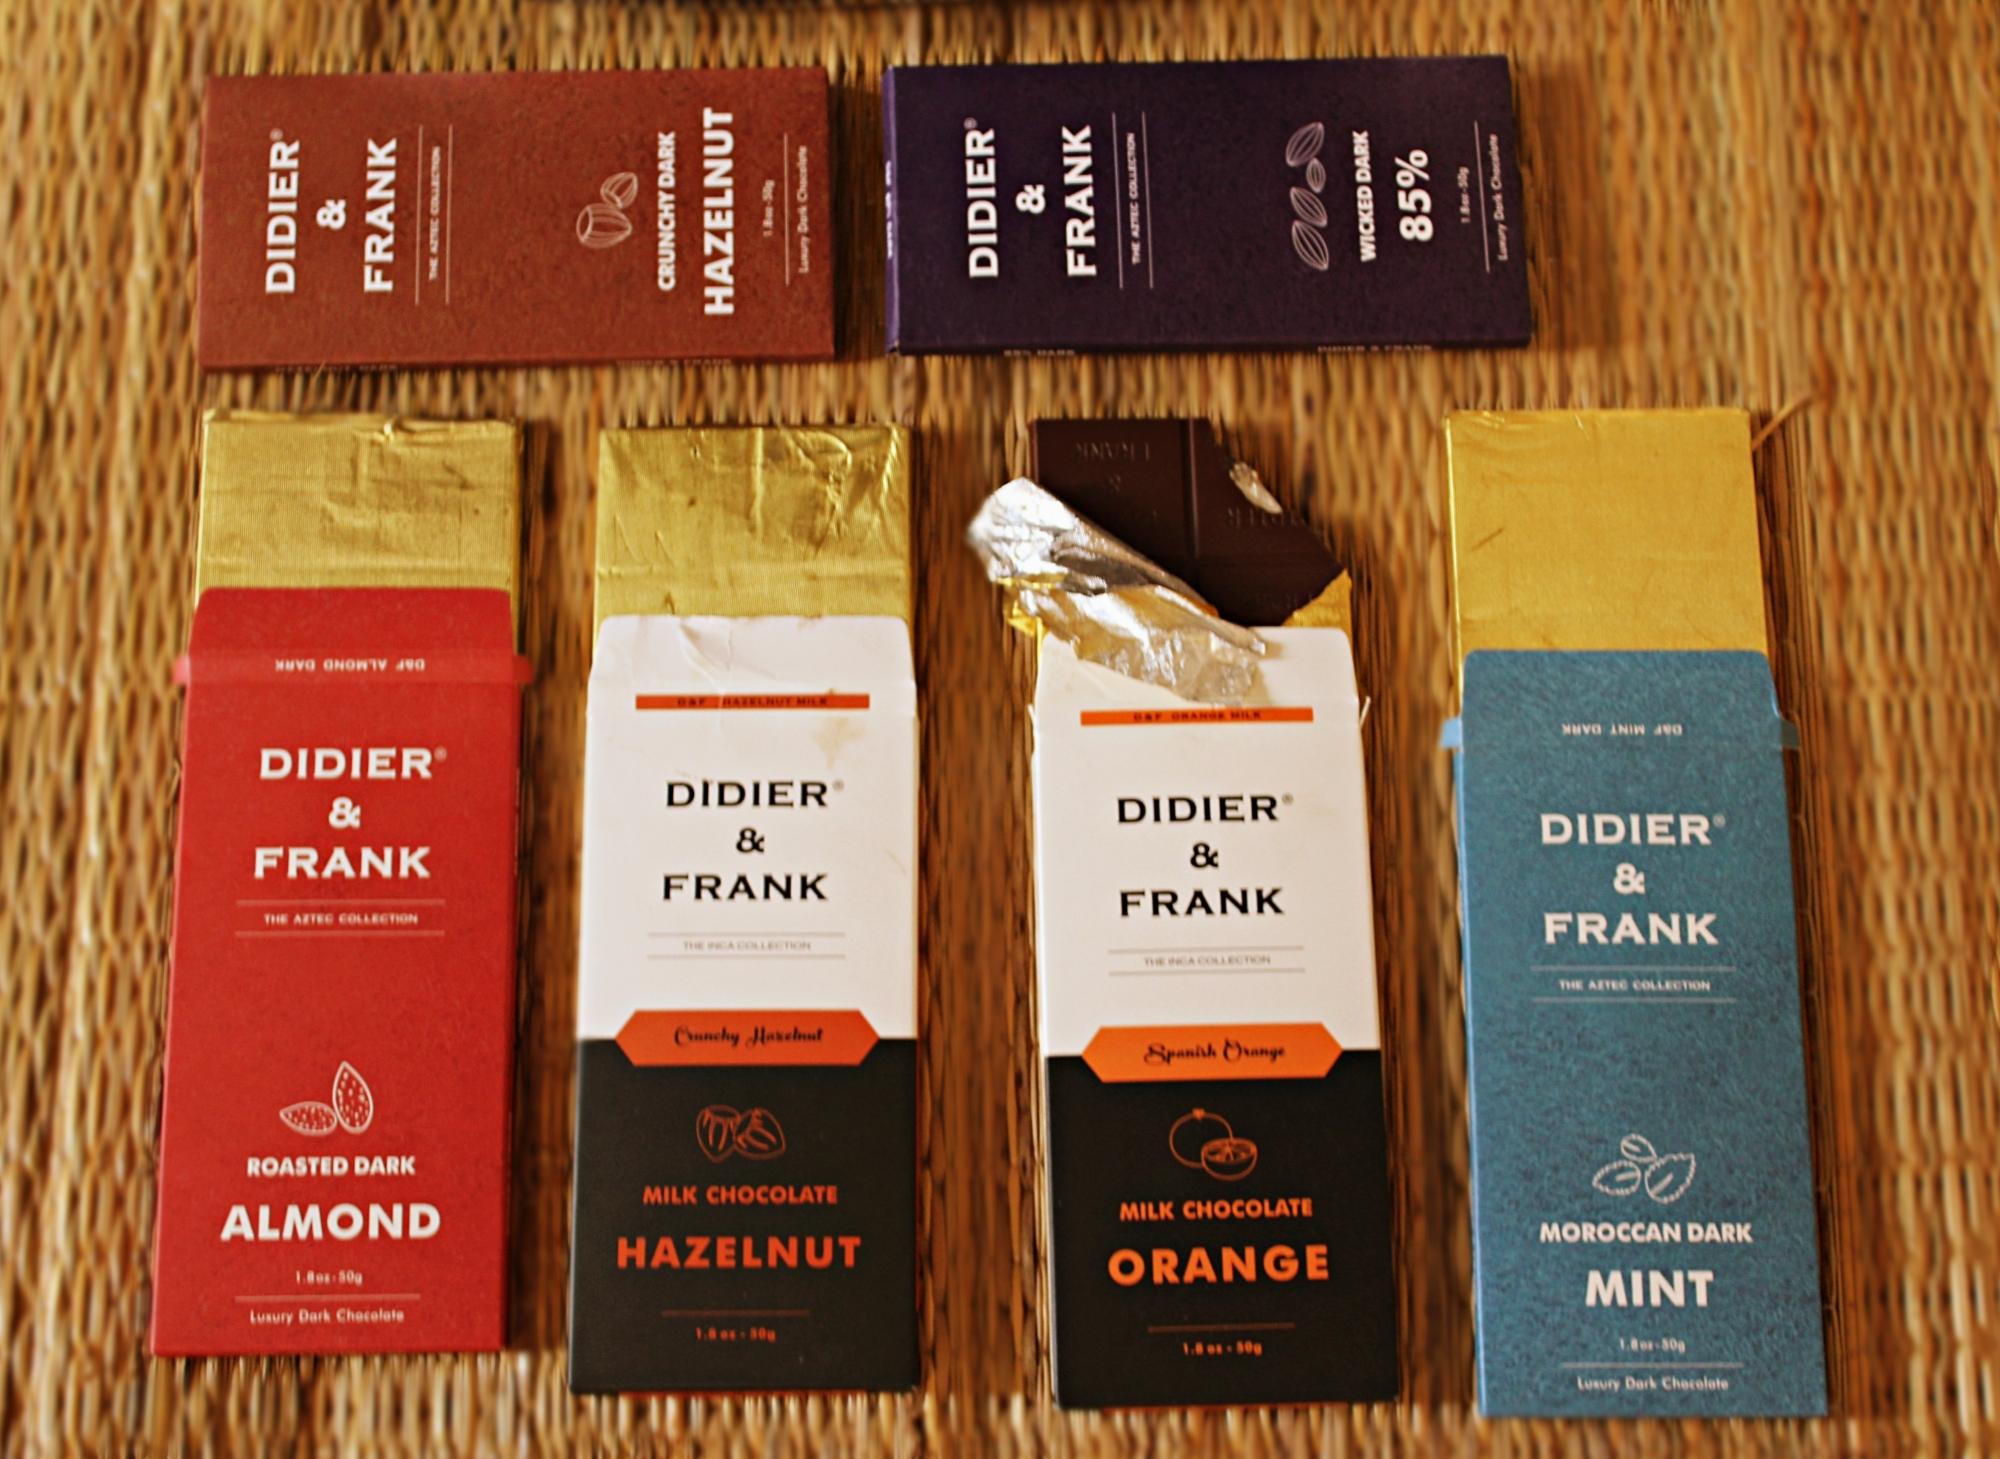 Didier and Frank Dark Chocolate